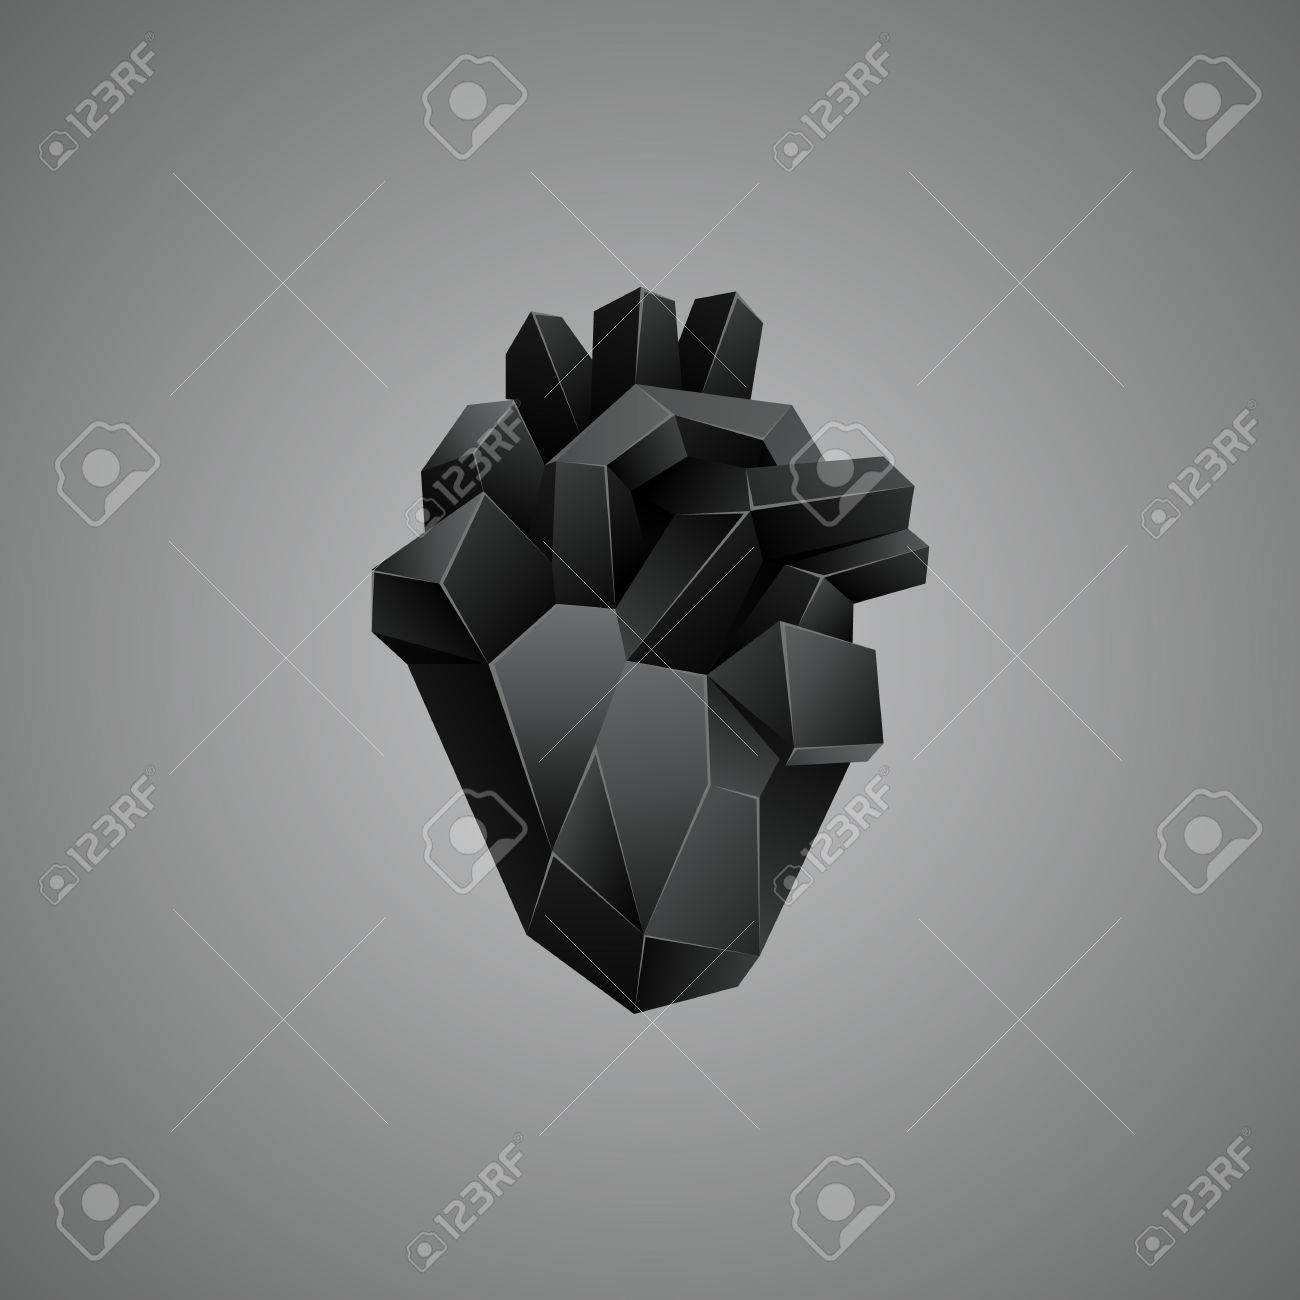 Negro Corazón Humano Poli Baja Sobre Un Fondo Gris. órgano Anatomía ...